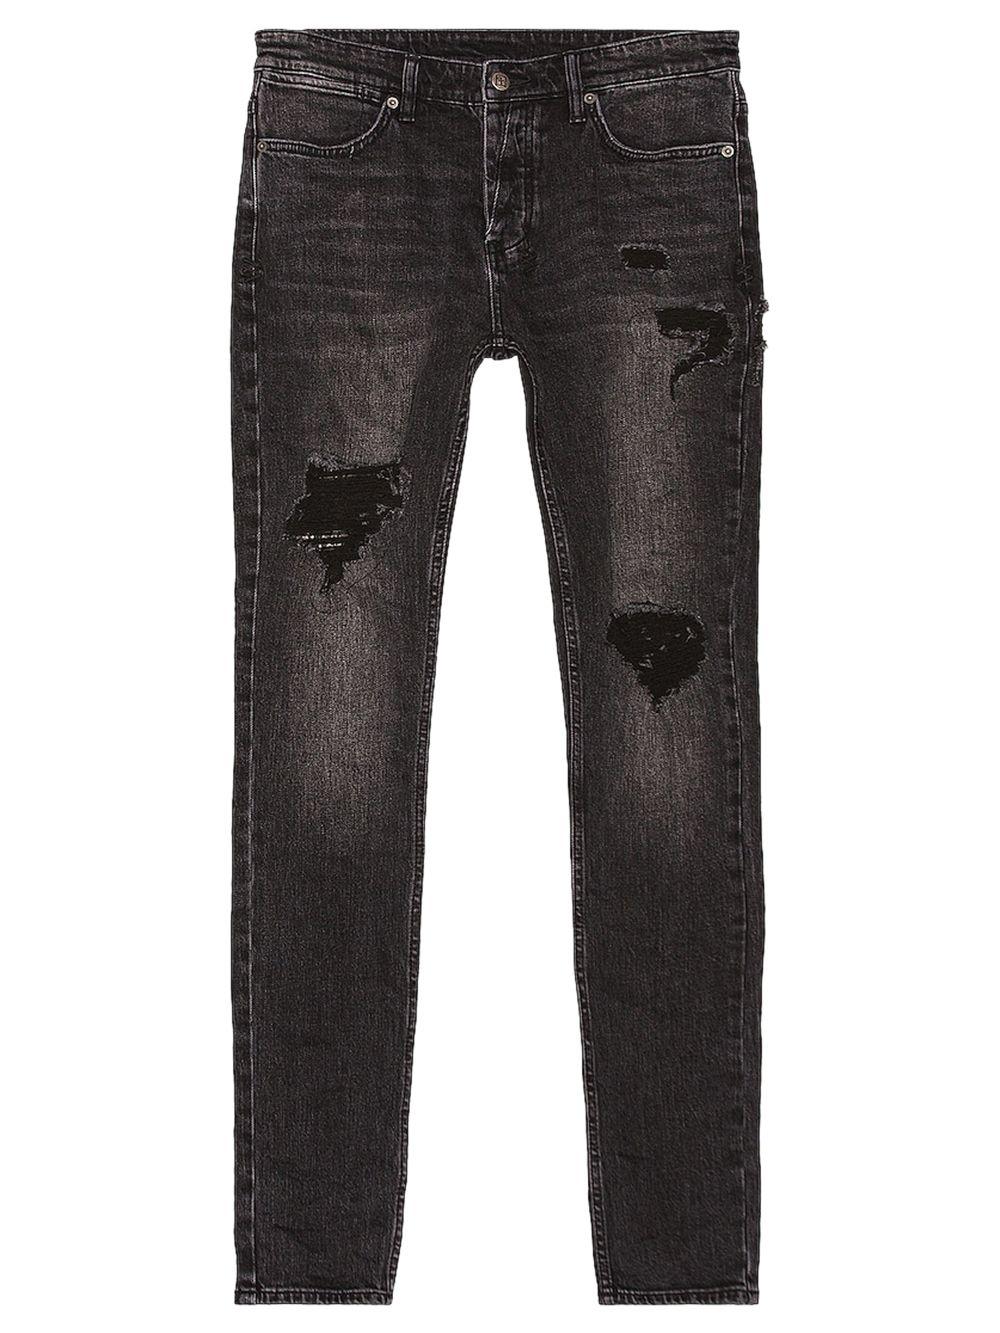 Van Winkle Jungle Patch Noir Jeans